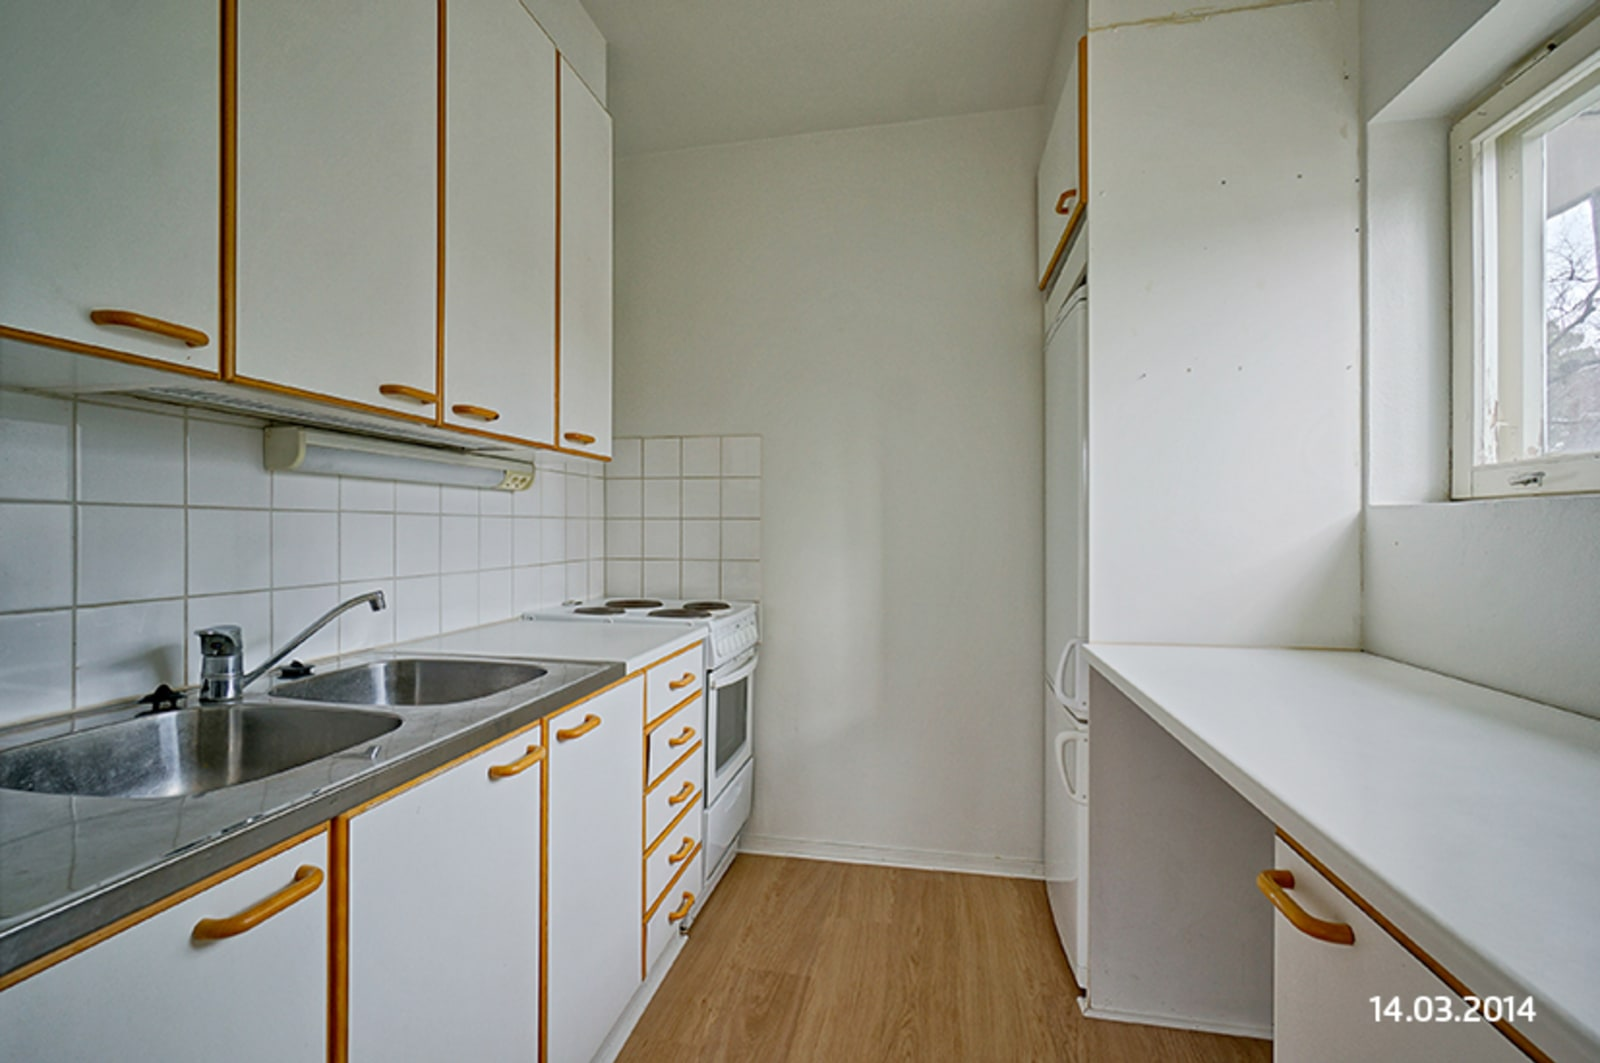 Helsinki, Kulosaari, Ståhlbergintie 4 A 005